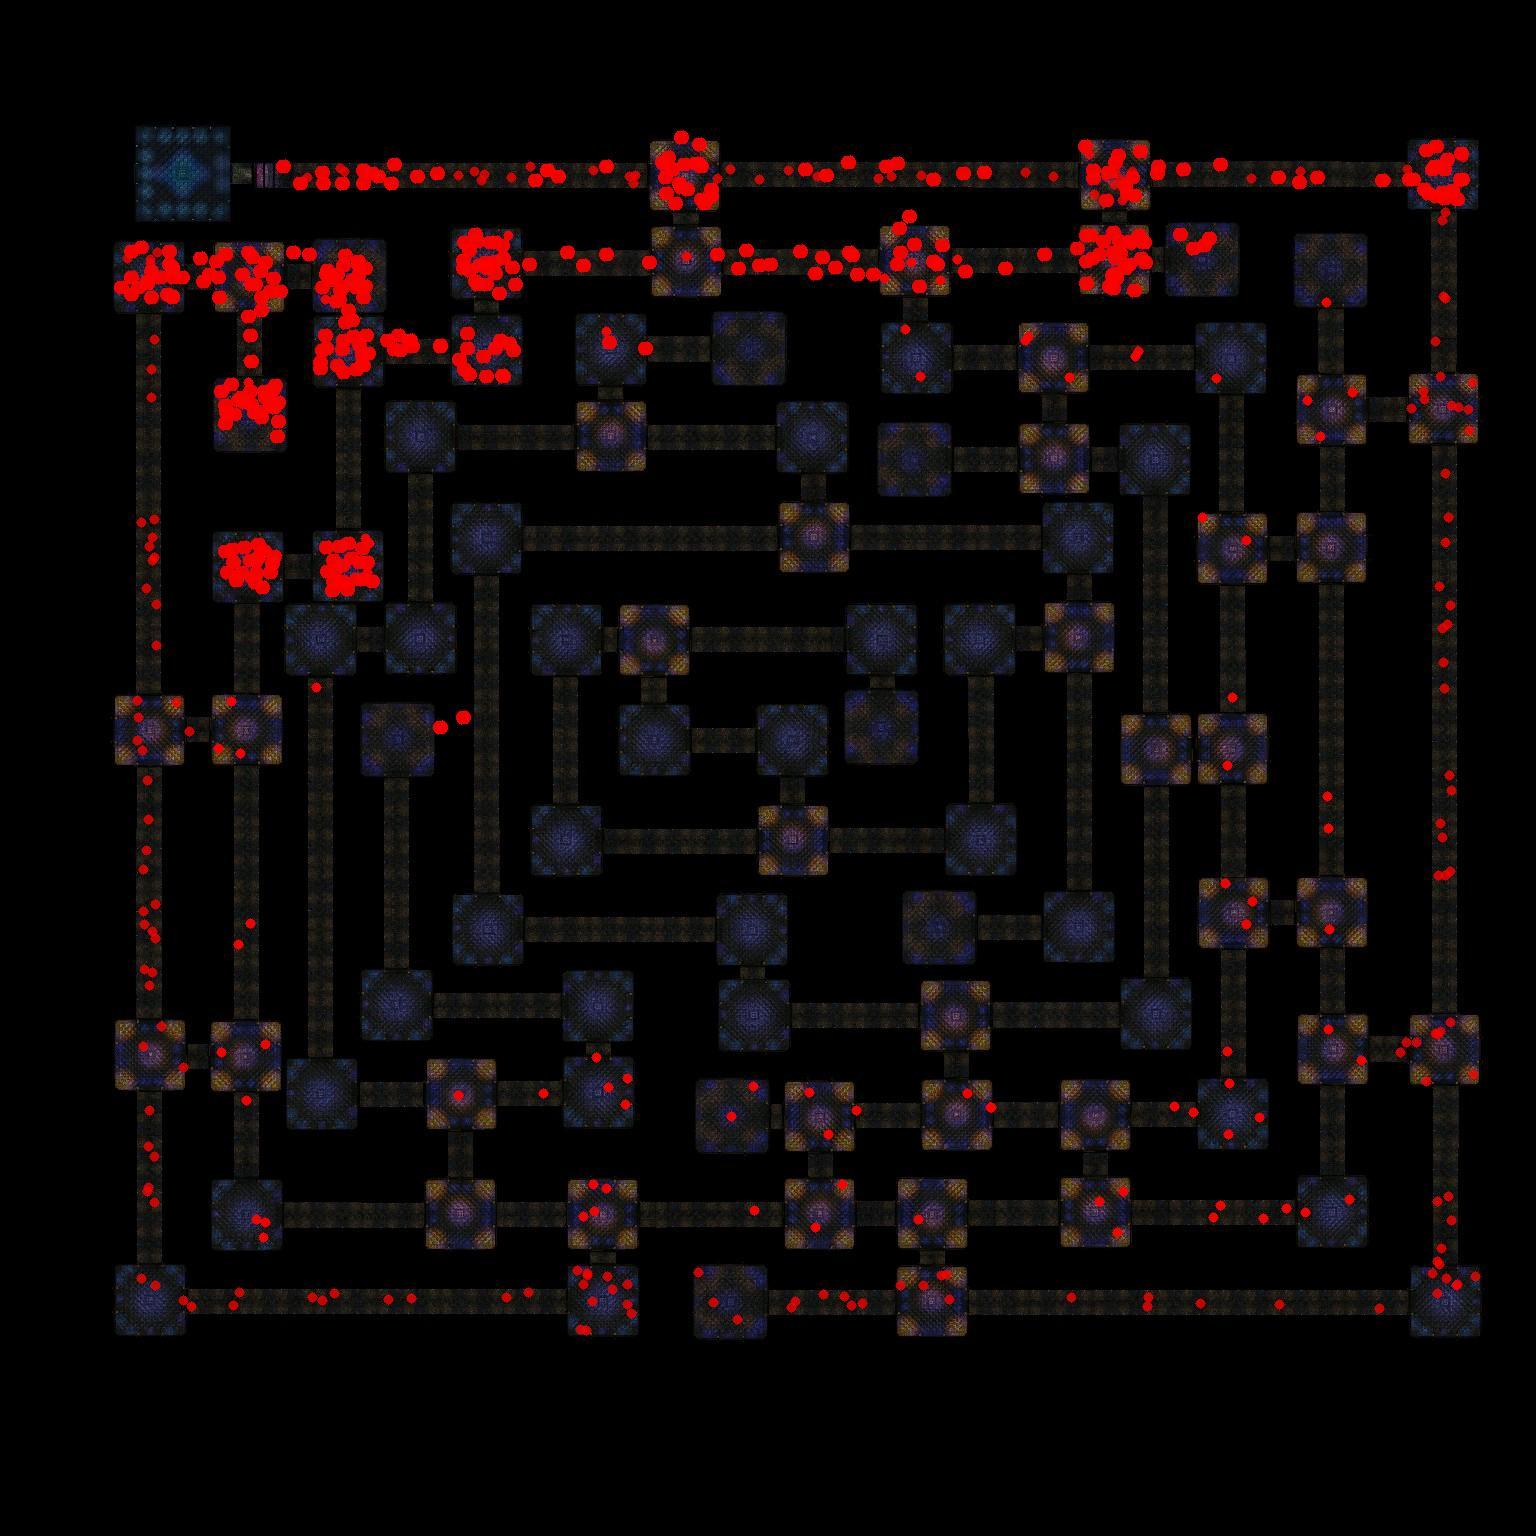 Metin2 Setaou Monster Bogenschütze Wiki Ekstasia2 fY6gyb7v